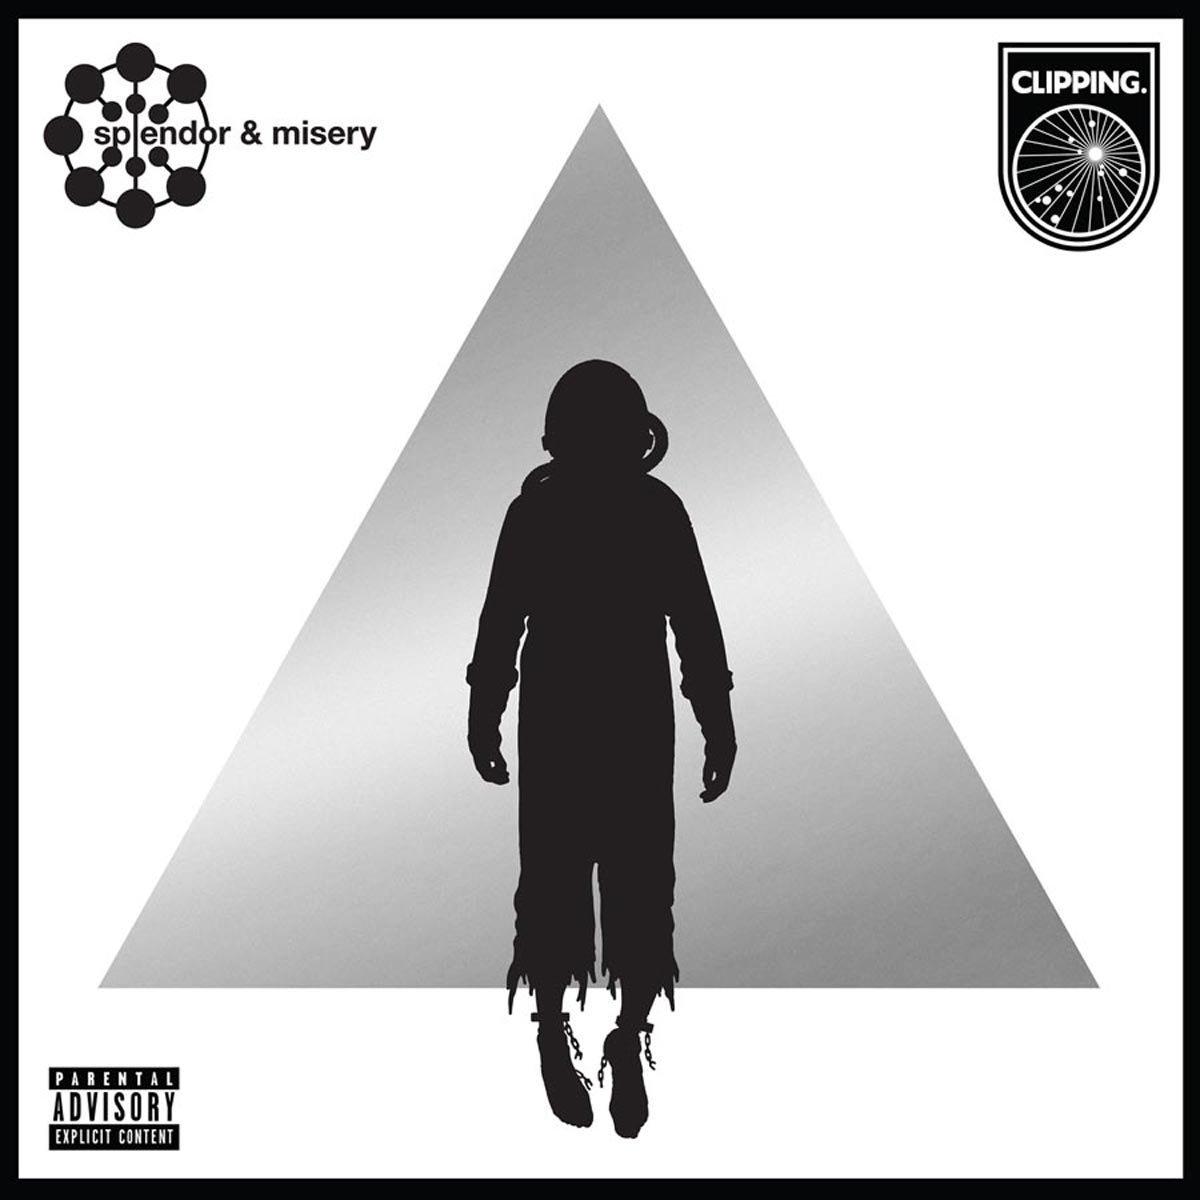 'Splendor & Misery' by clipping. album review by Josh Gabert-Doyon.